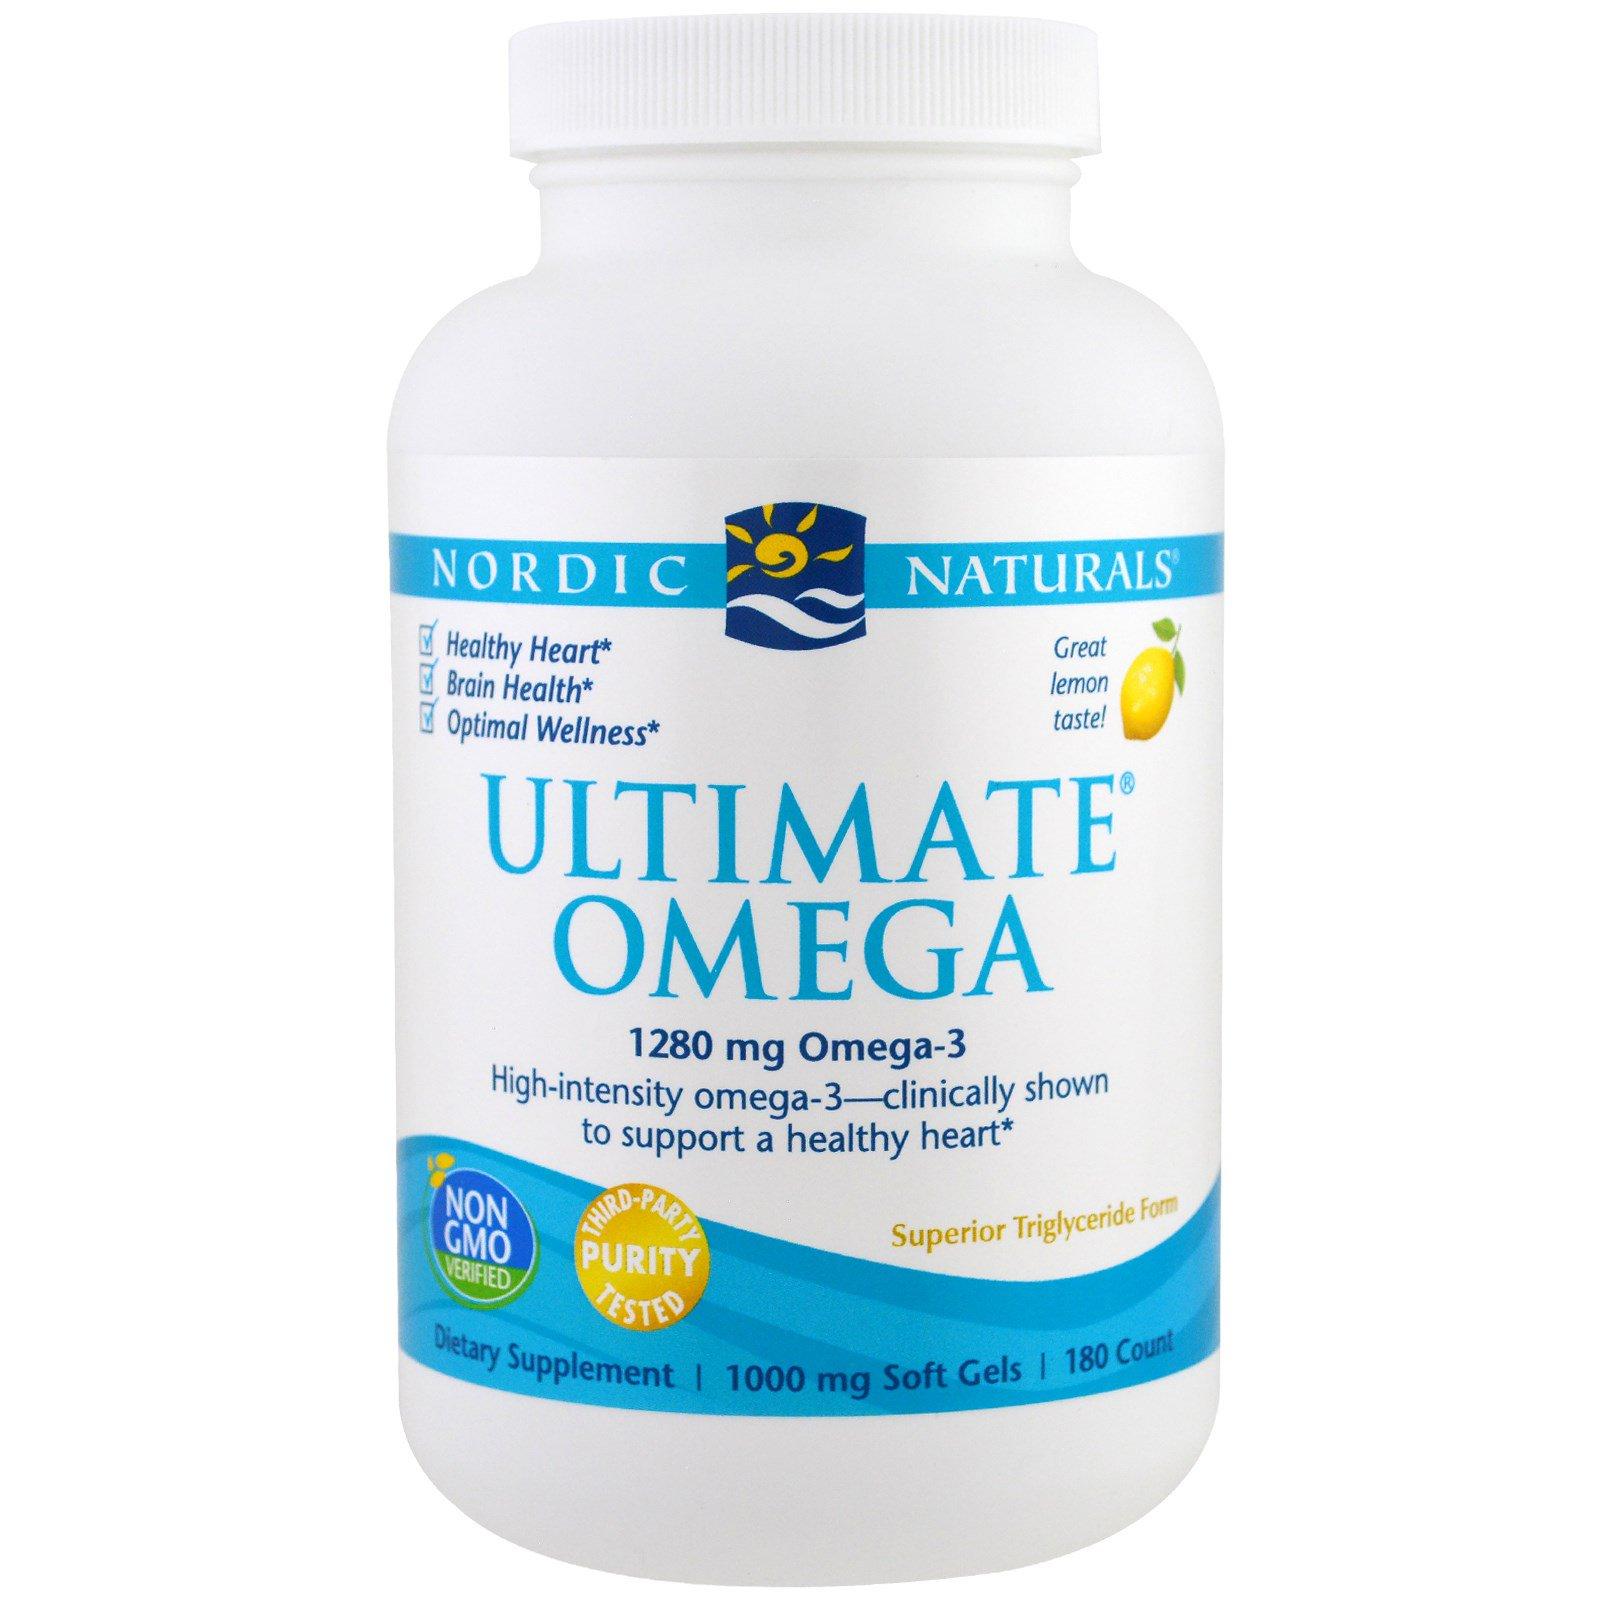 Nordic Naturals, Ultimate Omega, со вкусом лимона, 1280 мг, 180 желатиновых капсул